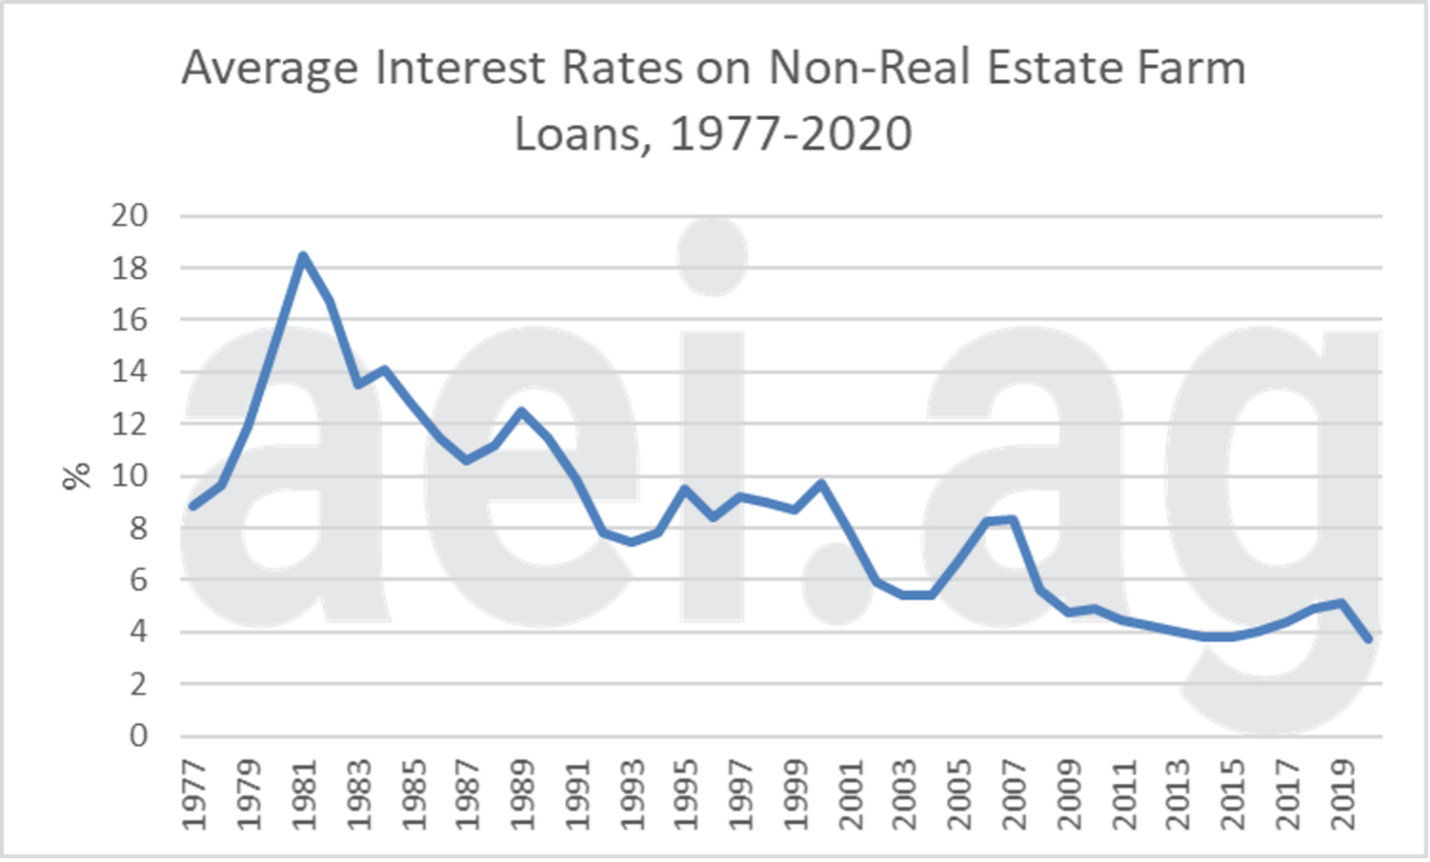 Figure 1. Average Interest Rate on Non-Real Estate Farm Loans, 1977-2020. Data Source: Kansas City Federal Reserve, Ag Finance Databook.